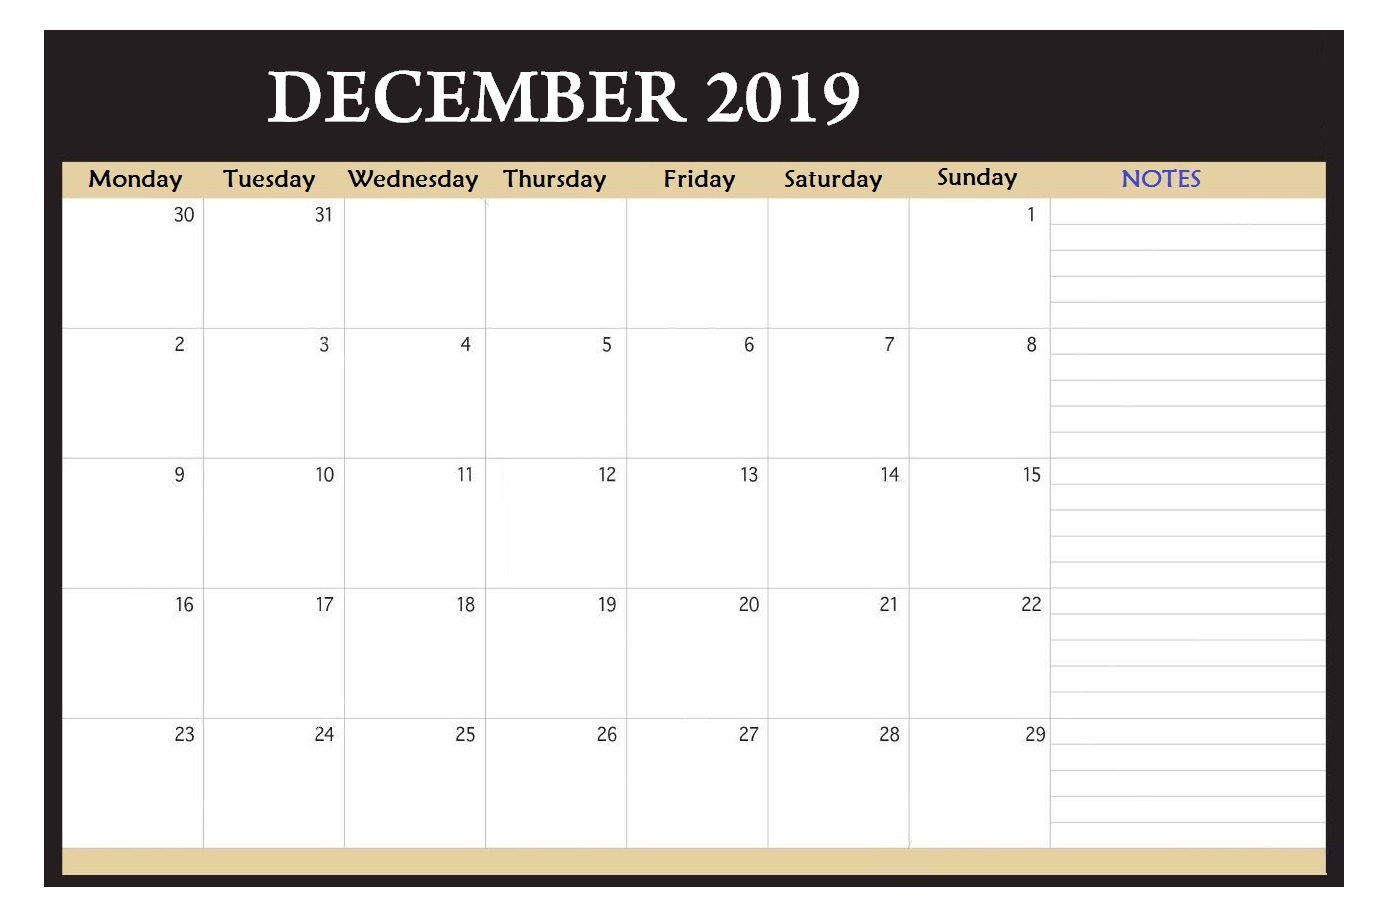 December 2019 Desk Template